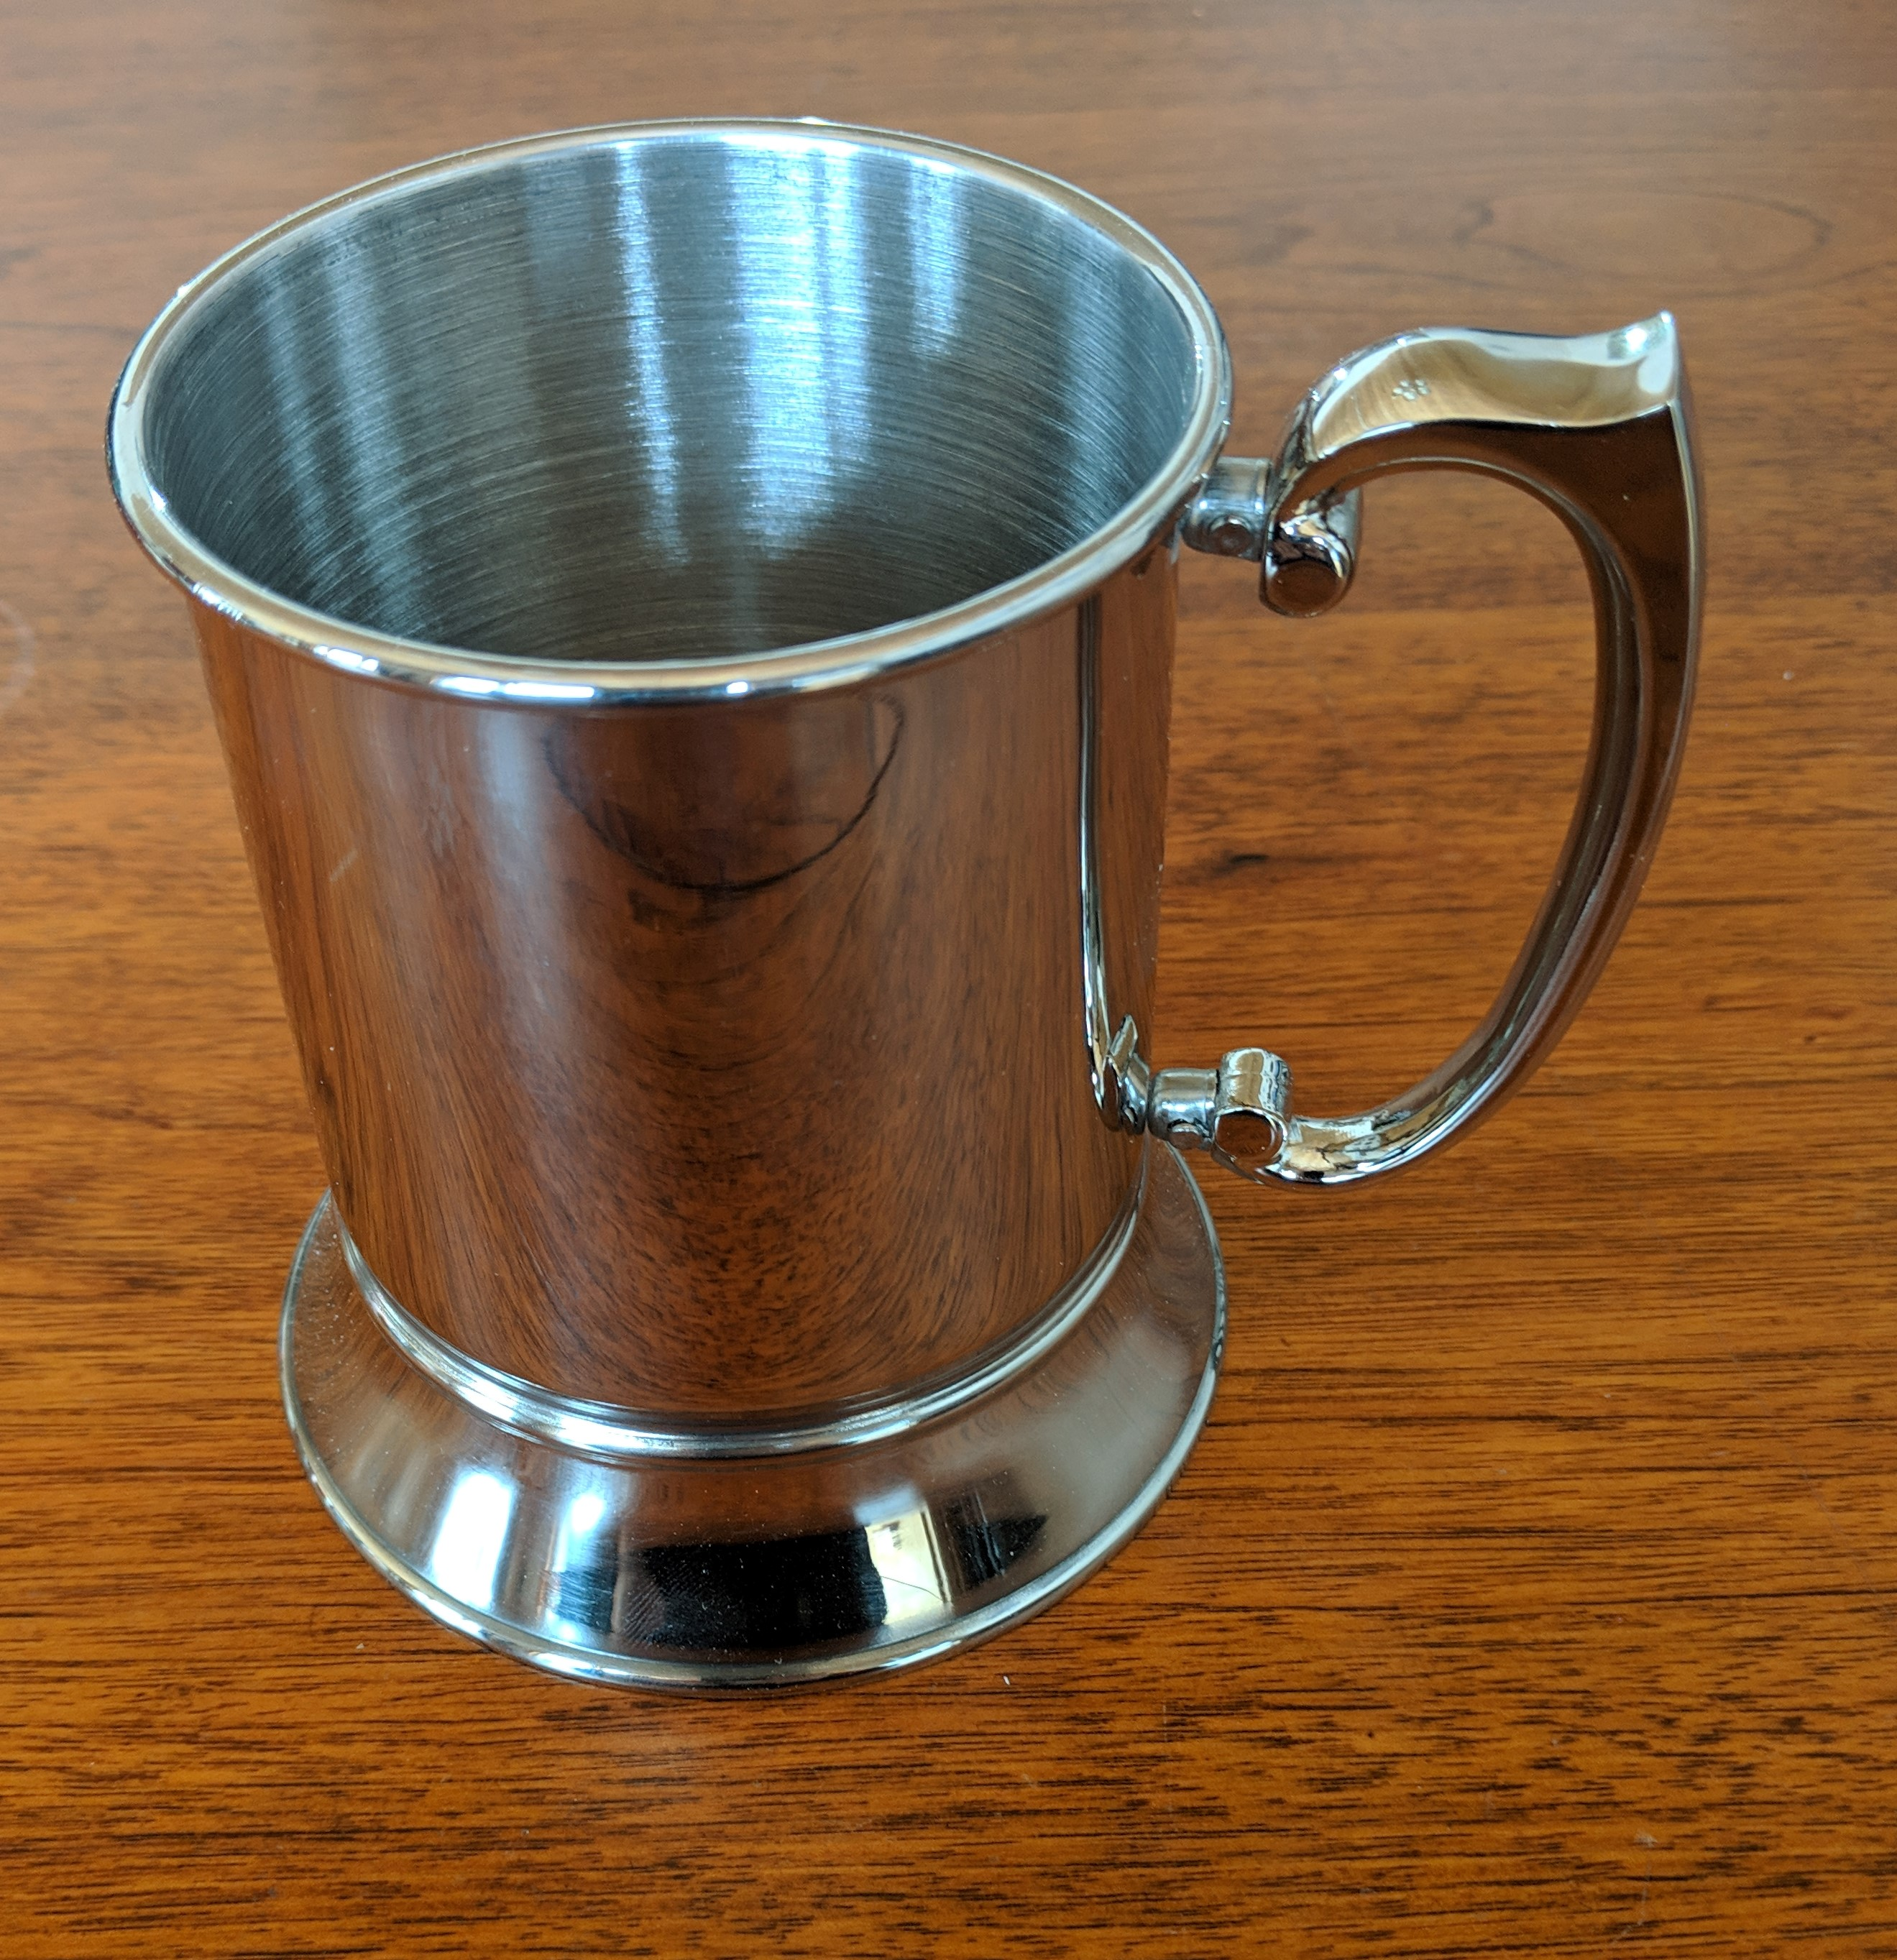 16 oz Stainless Steel Mug